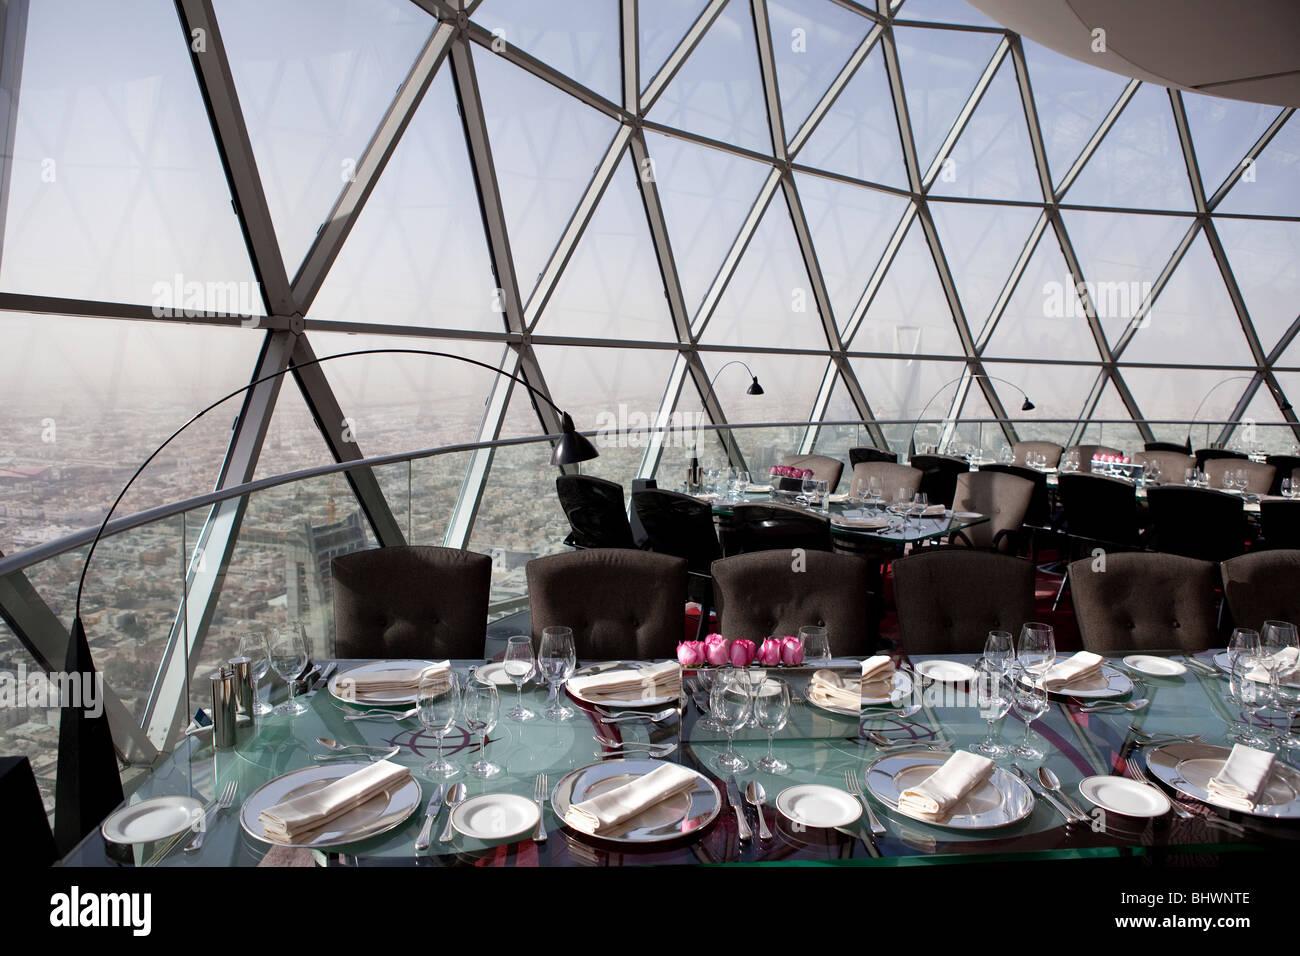 Al-Faisaliah Globe tower Riyadh Saudi Arabia - Stock Image